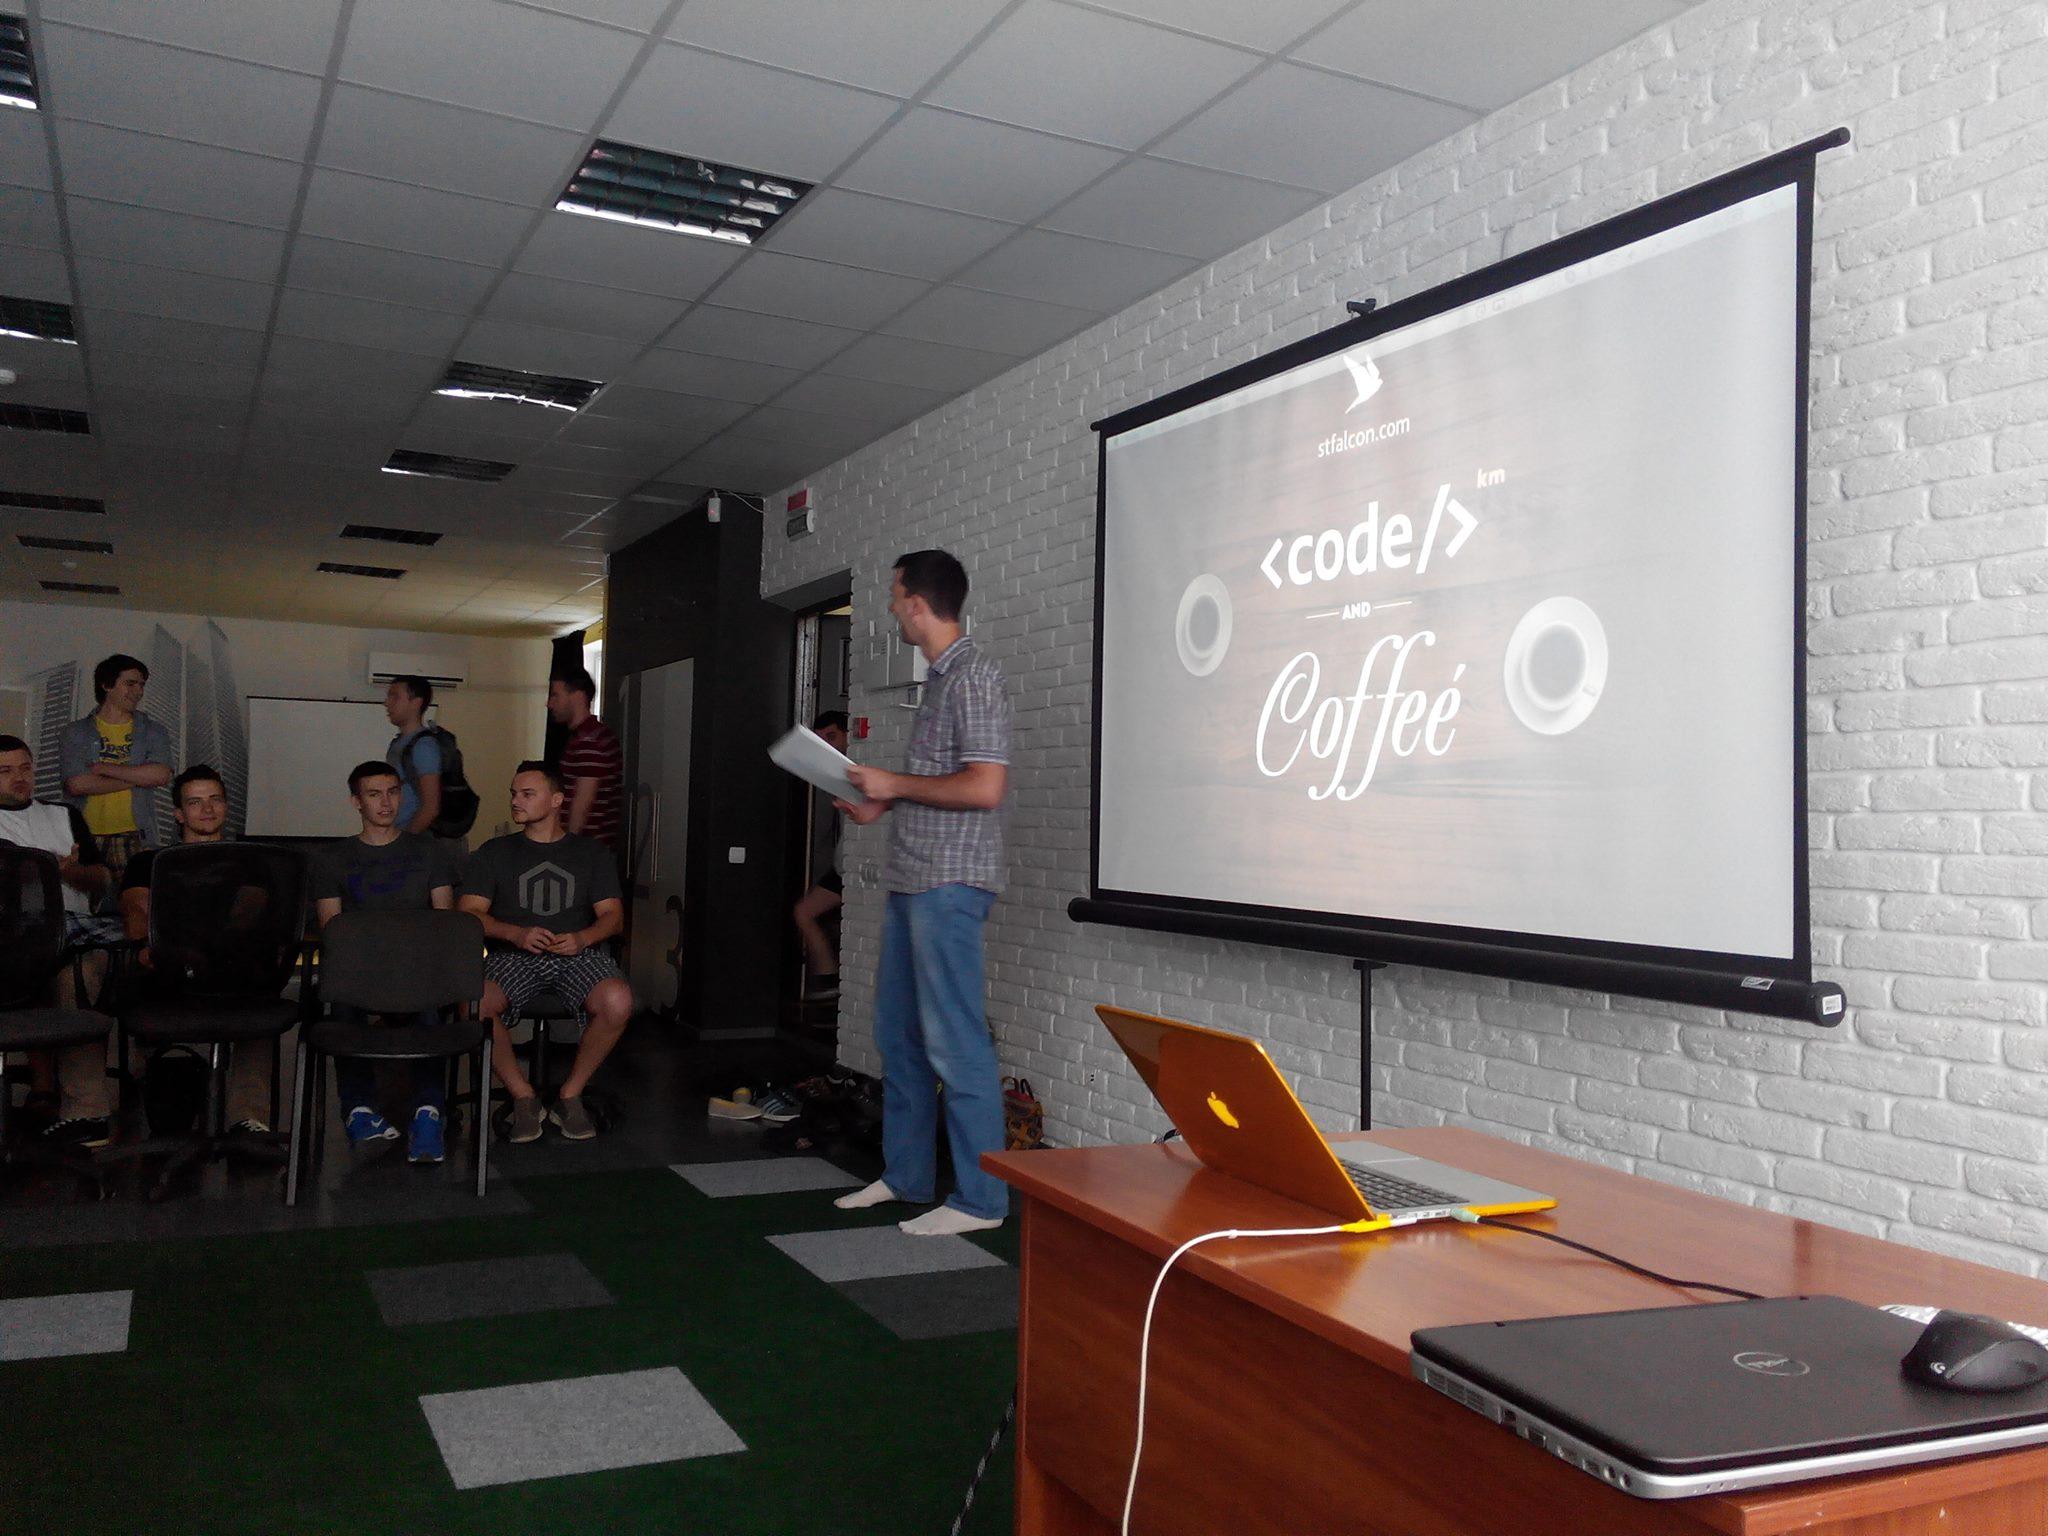 Km Code'n'Coffee #3 очима учасника